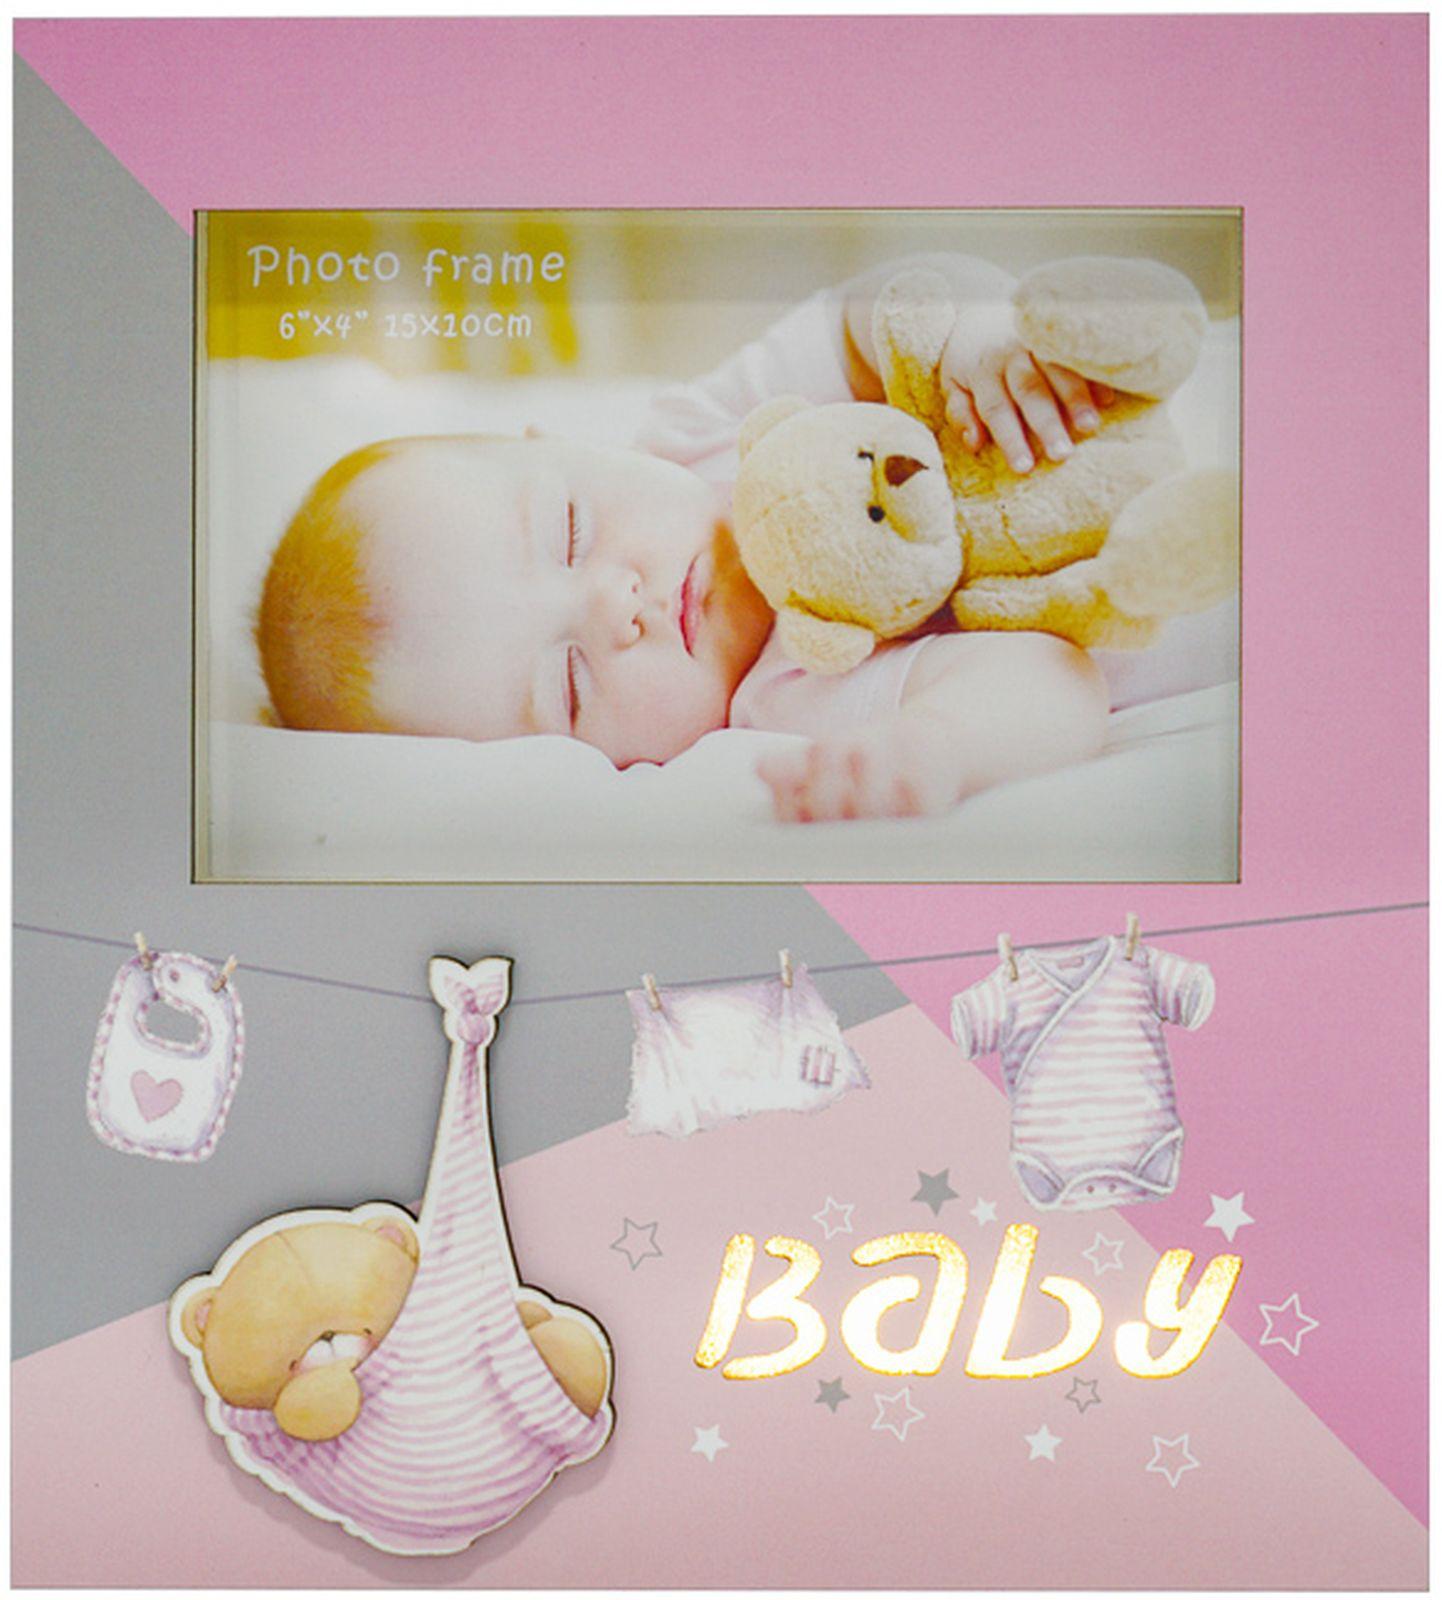 Фото - Фоторамка Fotografia Baby, FFL - 806, розовый, с подсветкой, для фото 10 х 15 см, 19 х 2,5 х 21 см dvotinst baby photography props wooden posing bed fotografia accessories infant toddler studio shooting photo props shower gift